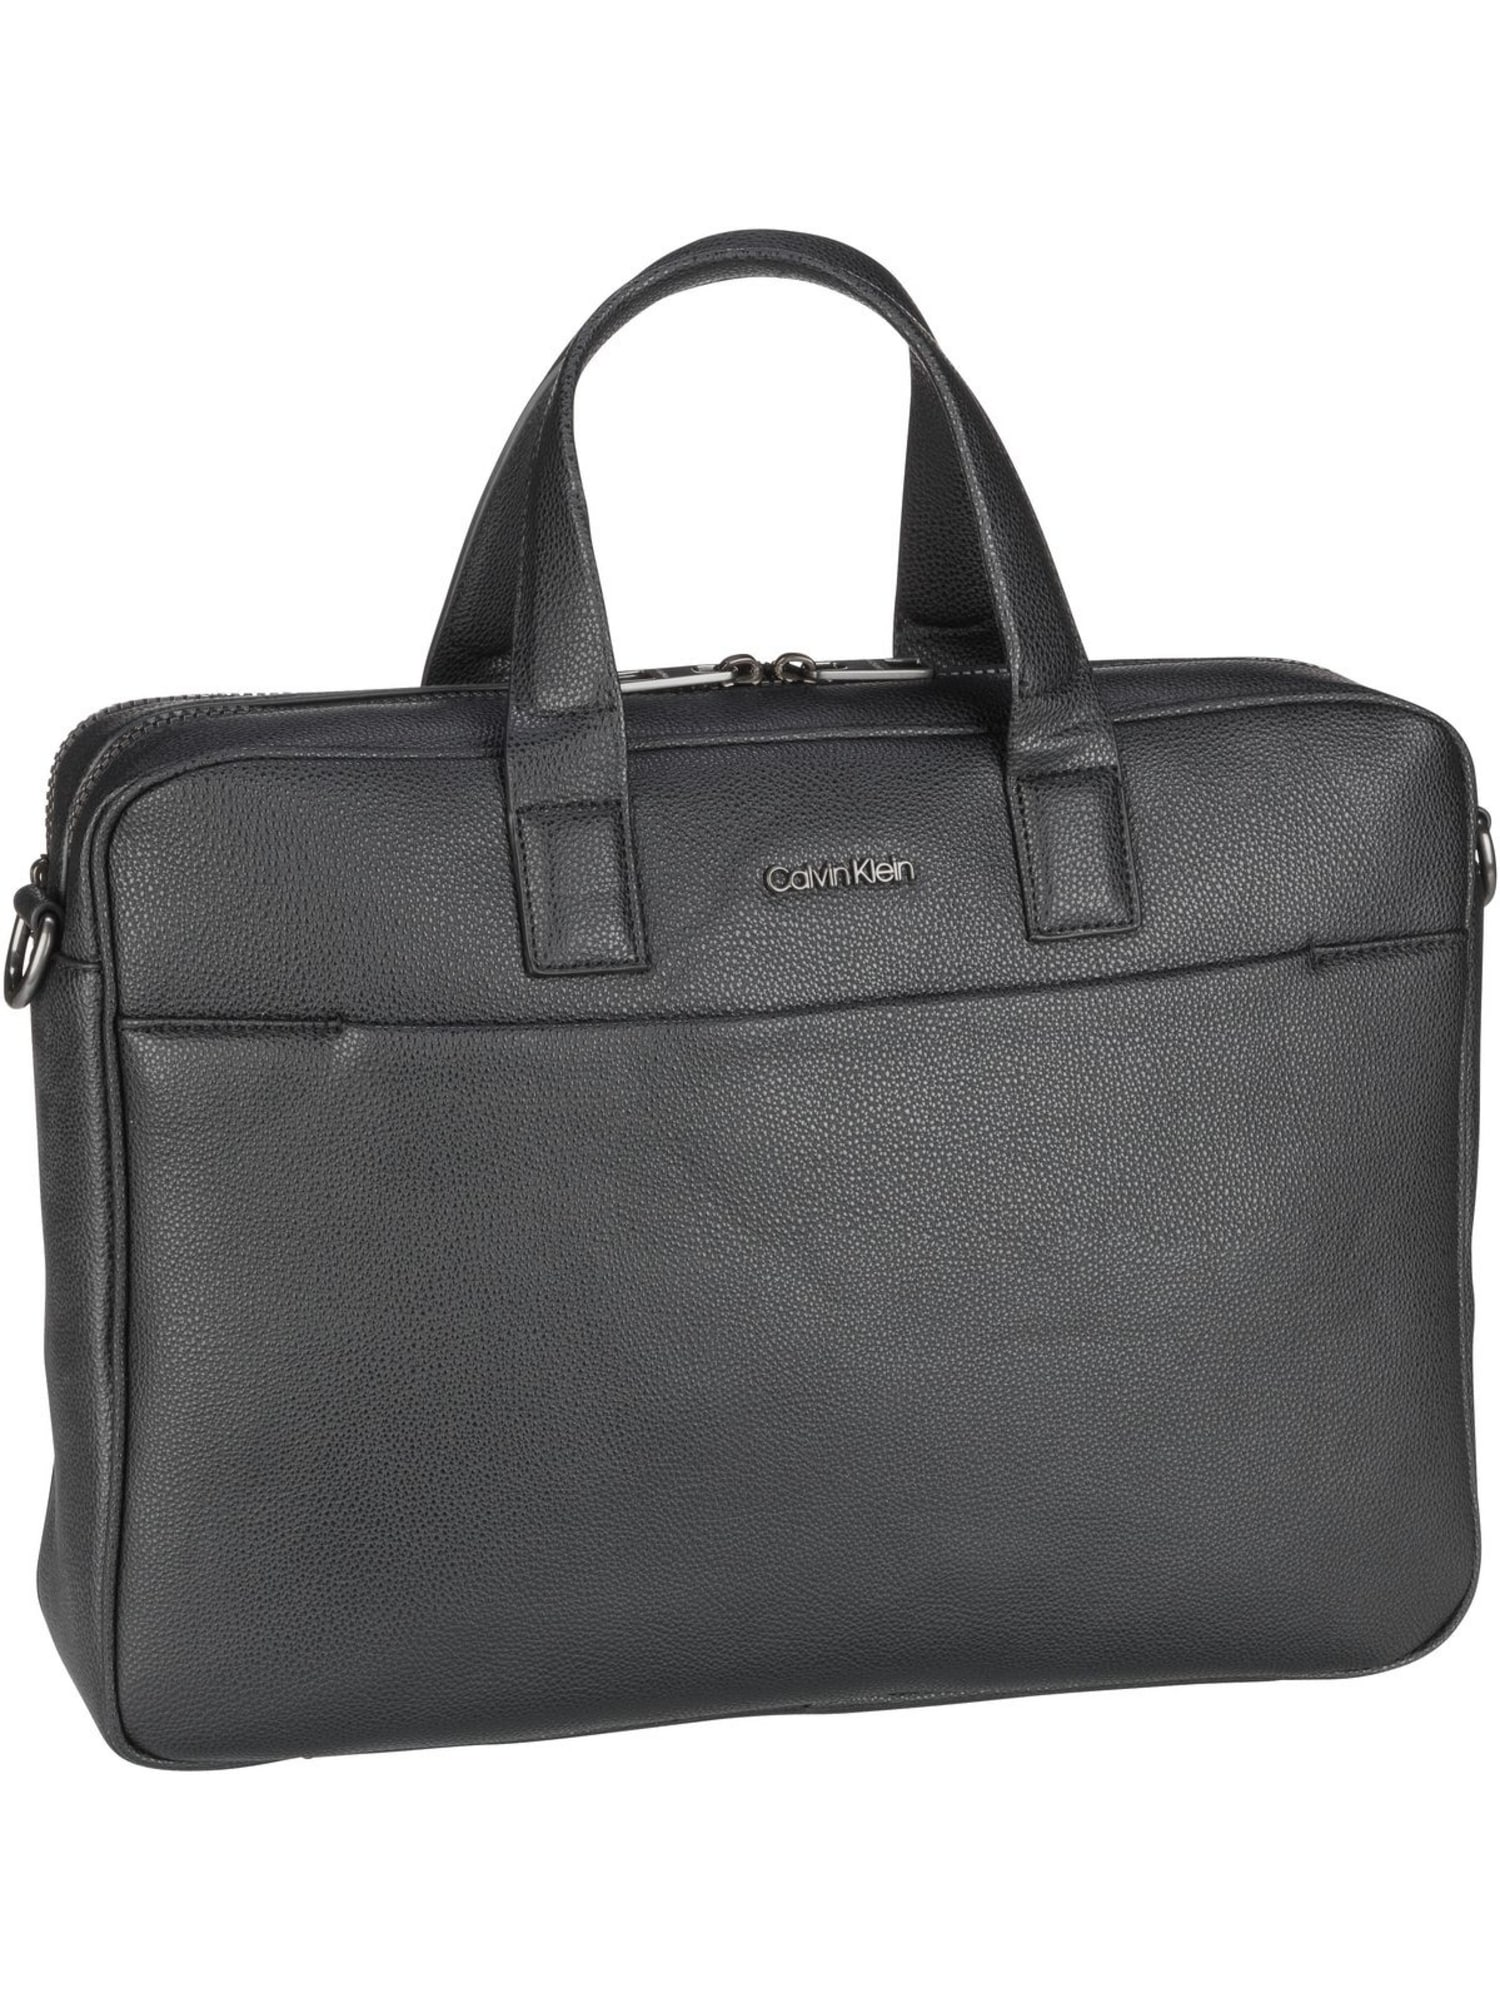 Calvin Klein Portfelis-rankinė juoda